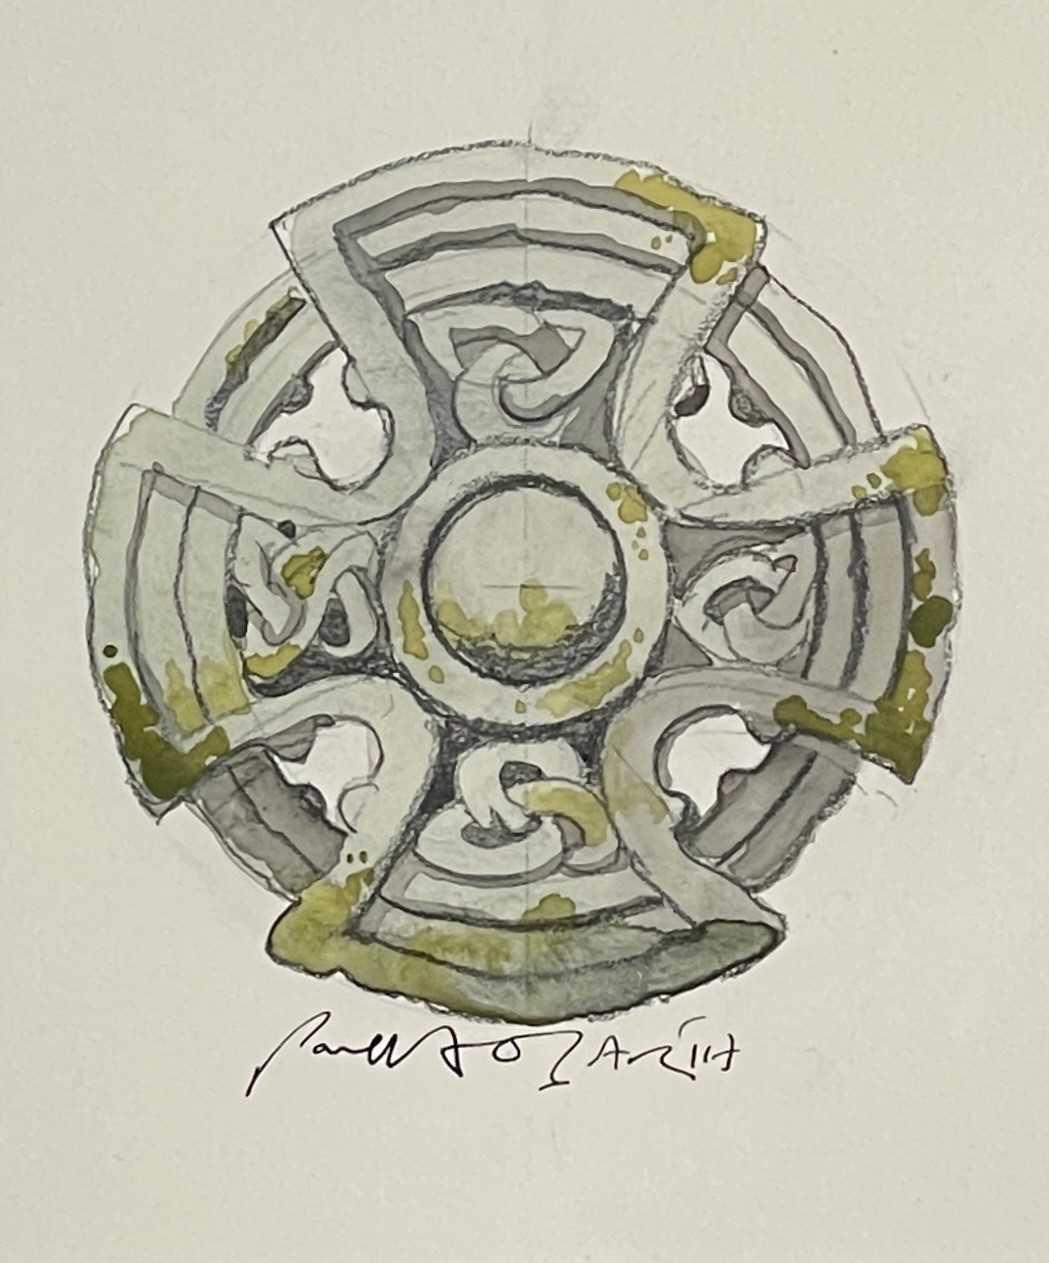 Paul HOGARTH (1917-2001)Celtic Cross, St Protus & Hyacinth - Blisland, Cornwall Watercolour Signed